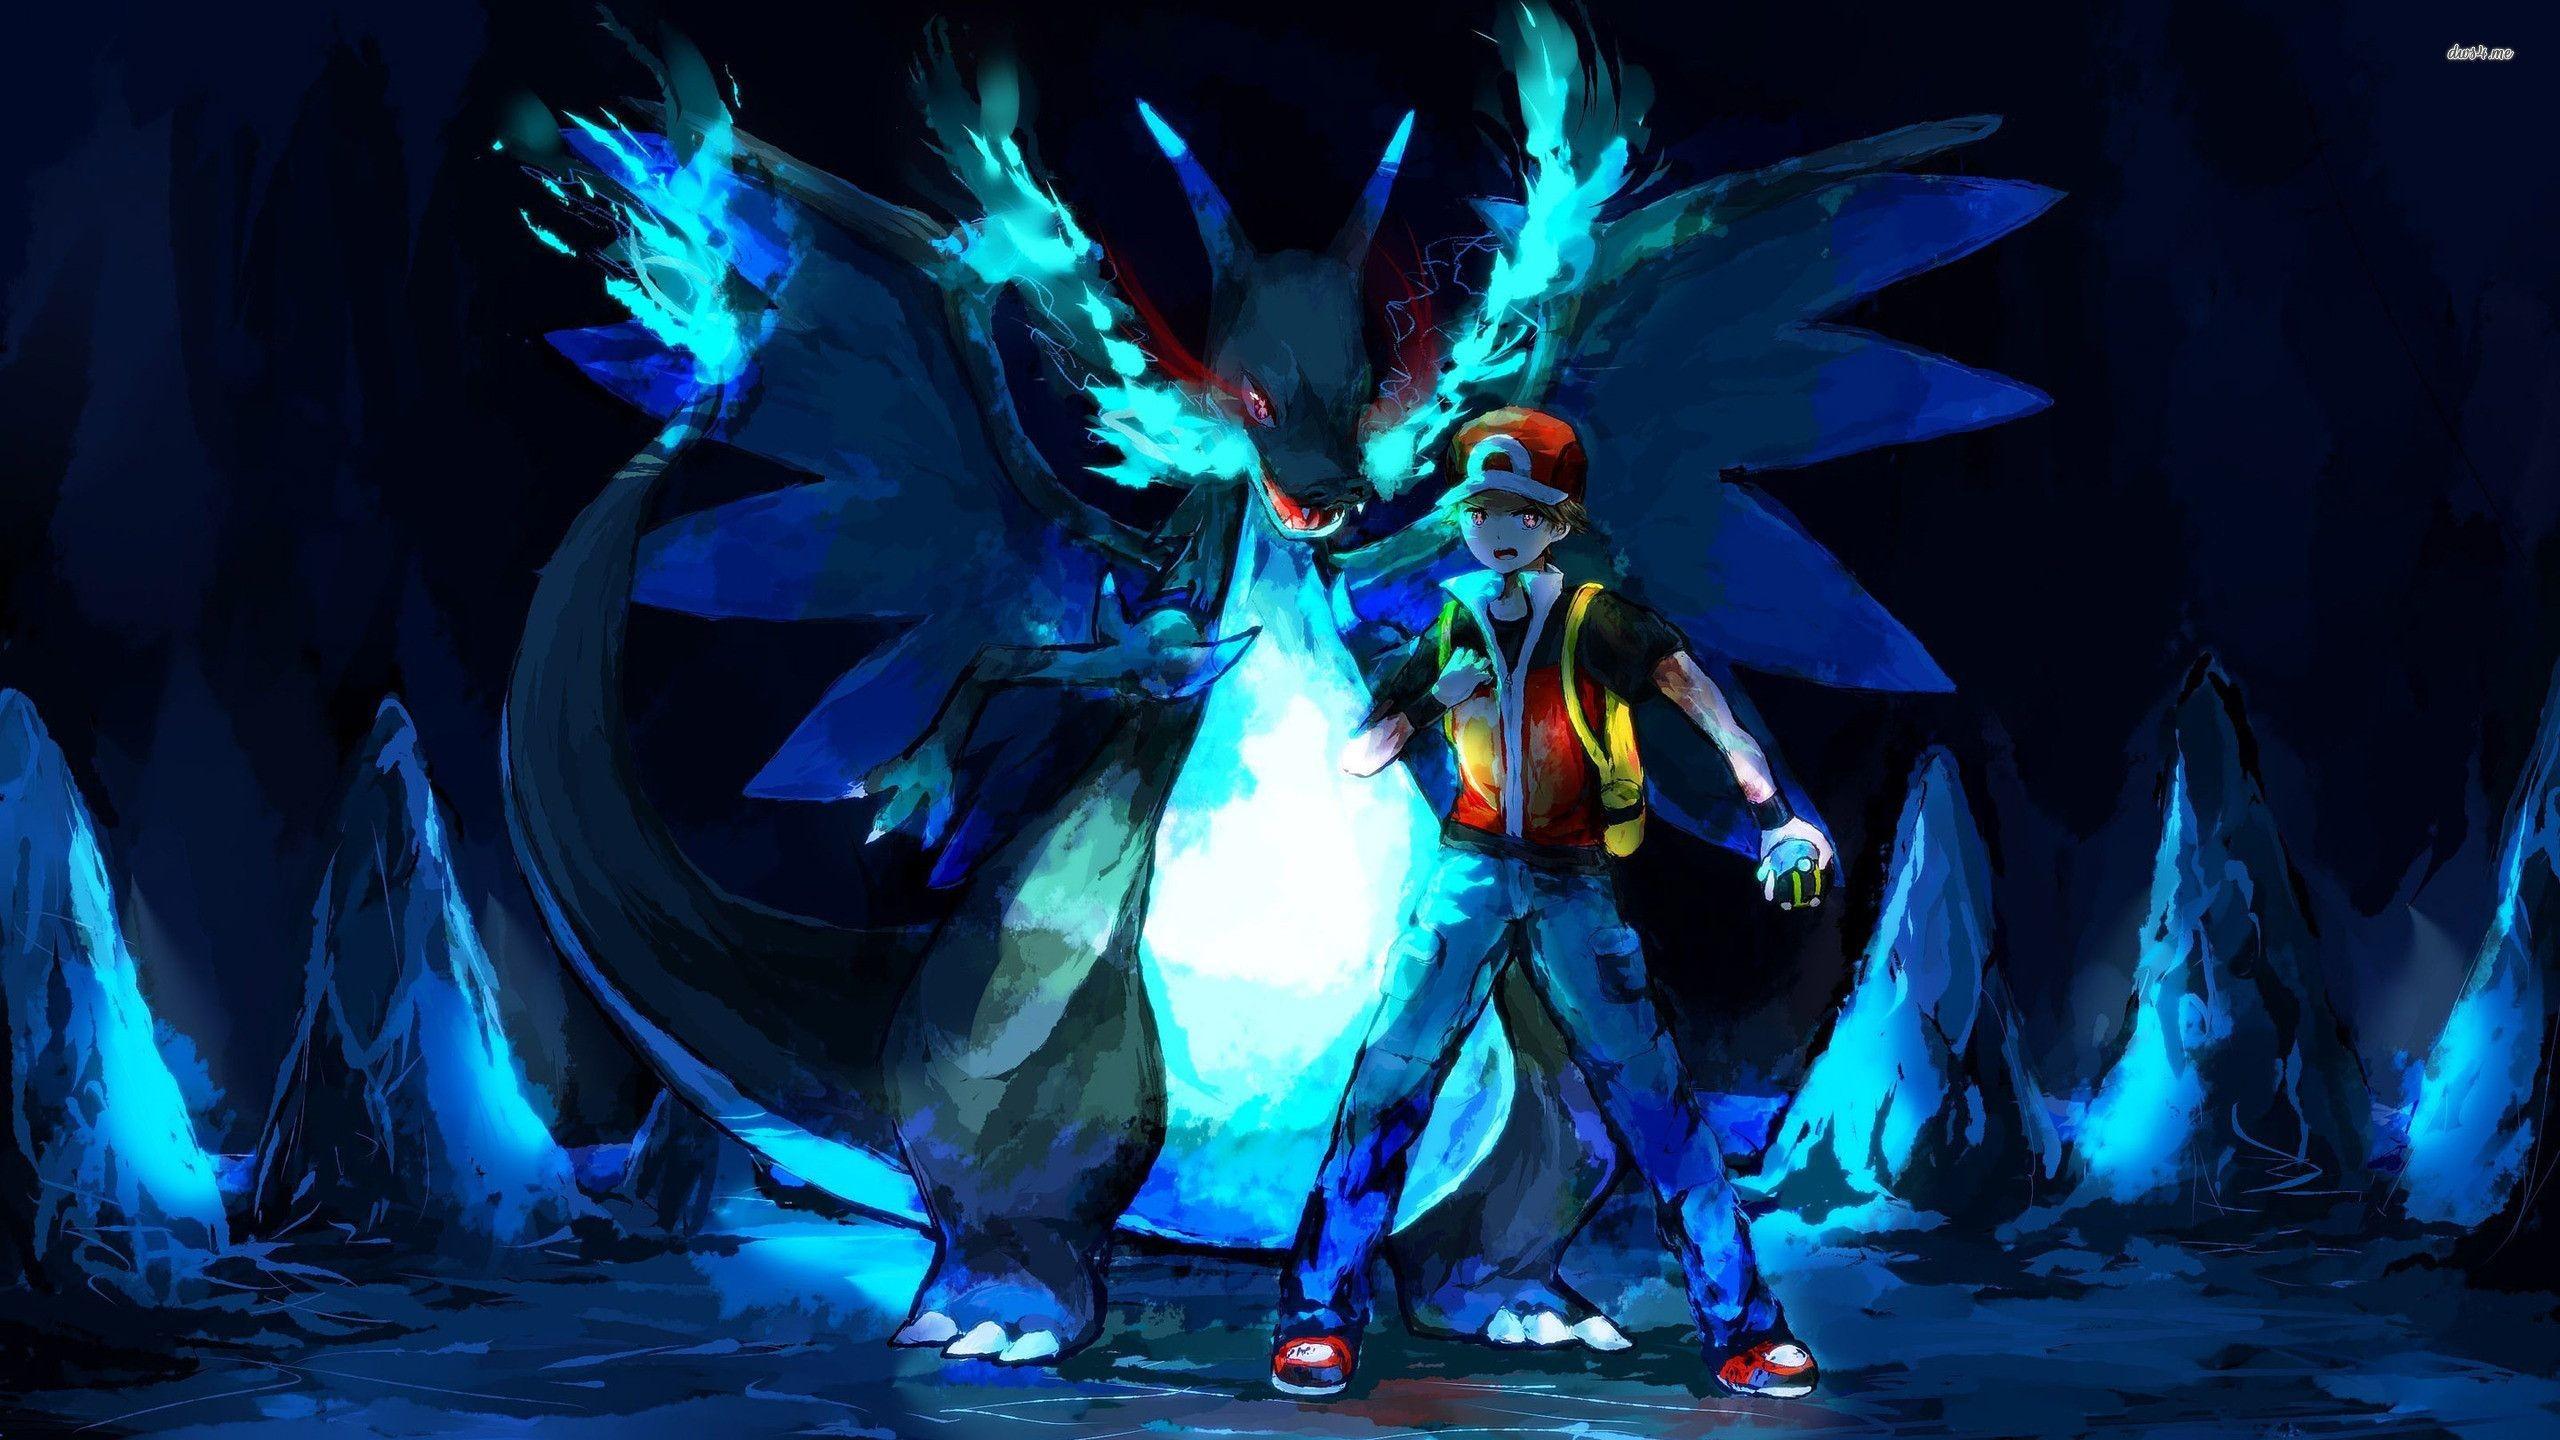 Pokemon Mega Charizard Wallpaper 70 Images